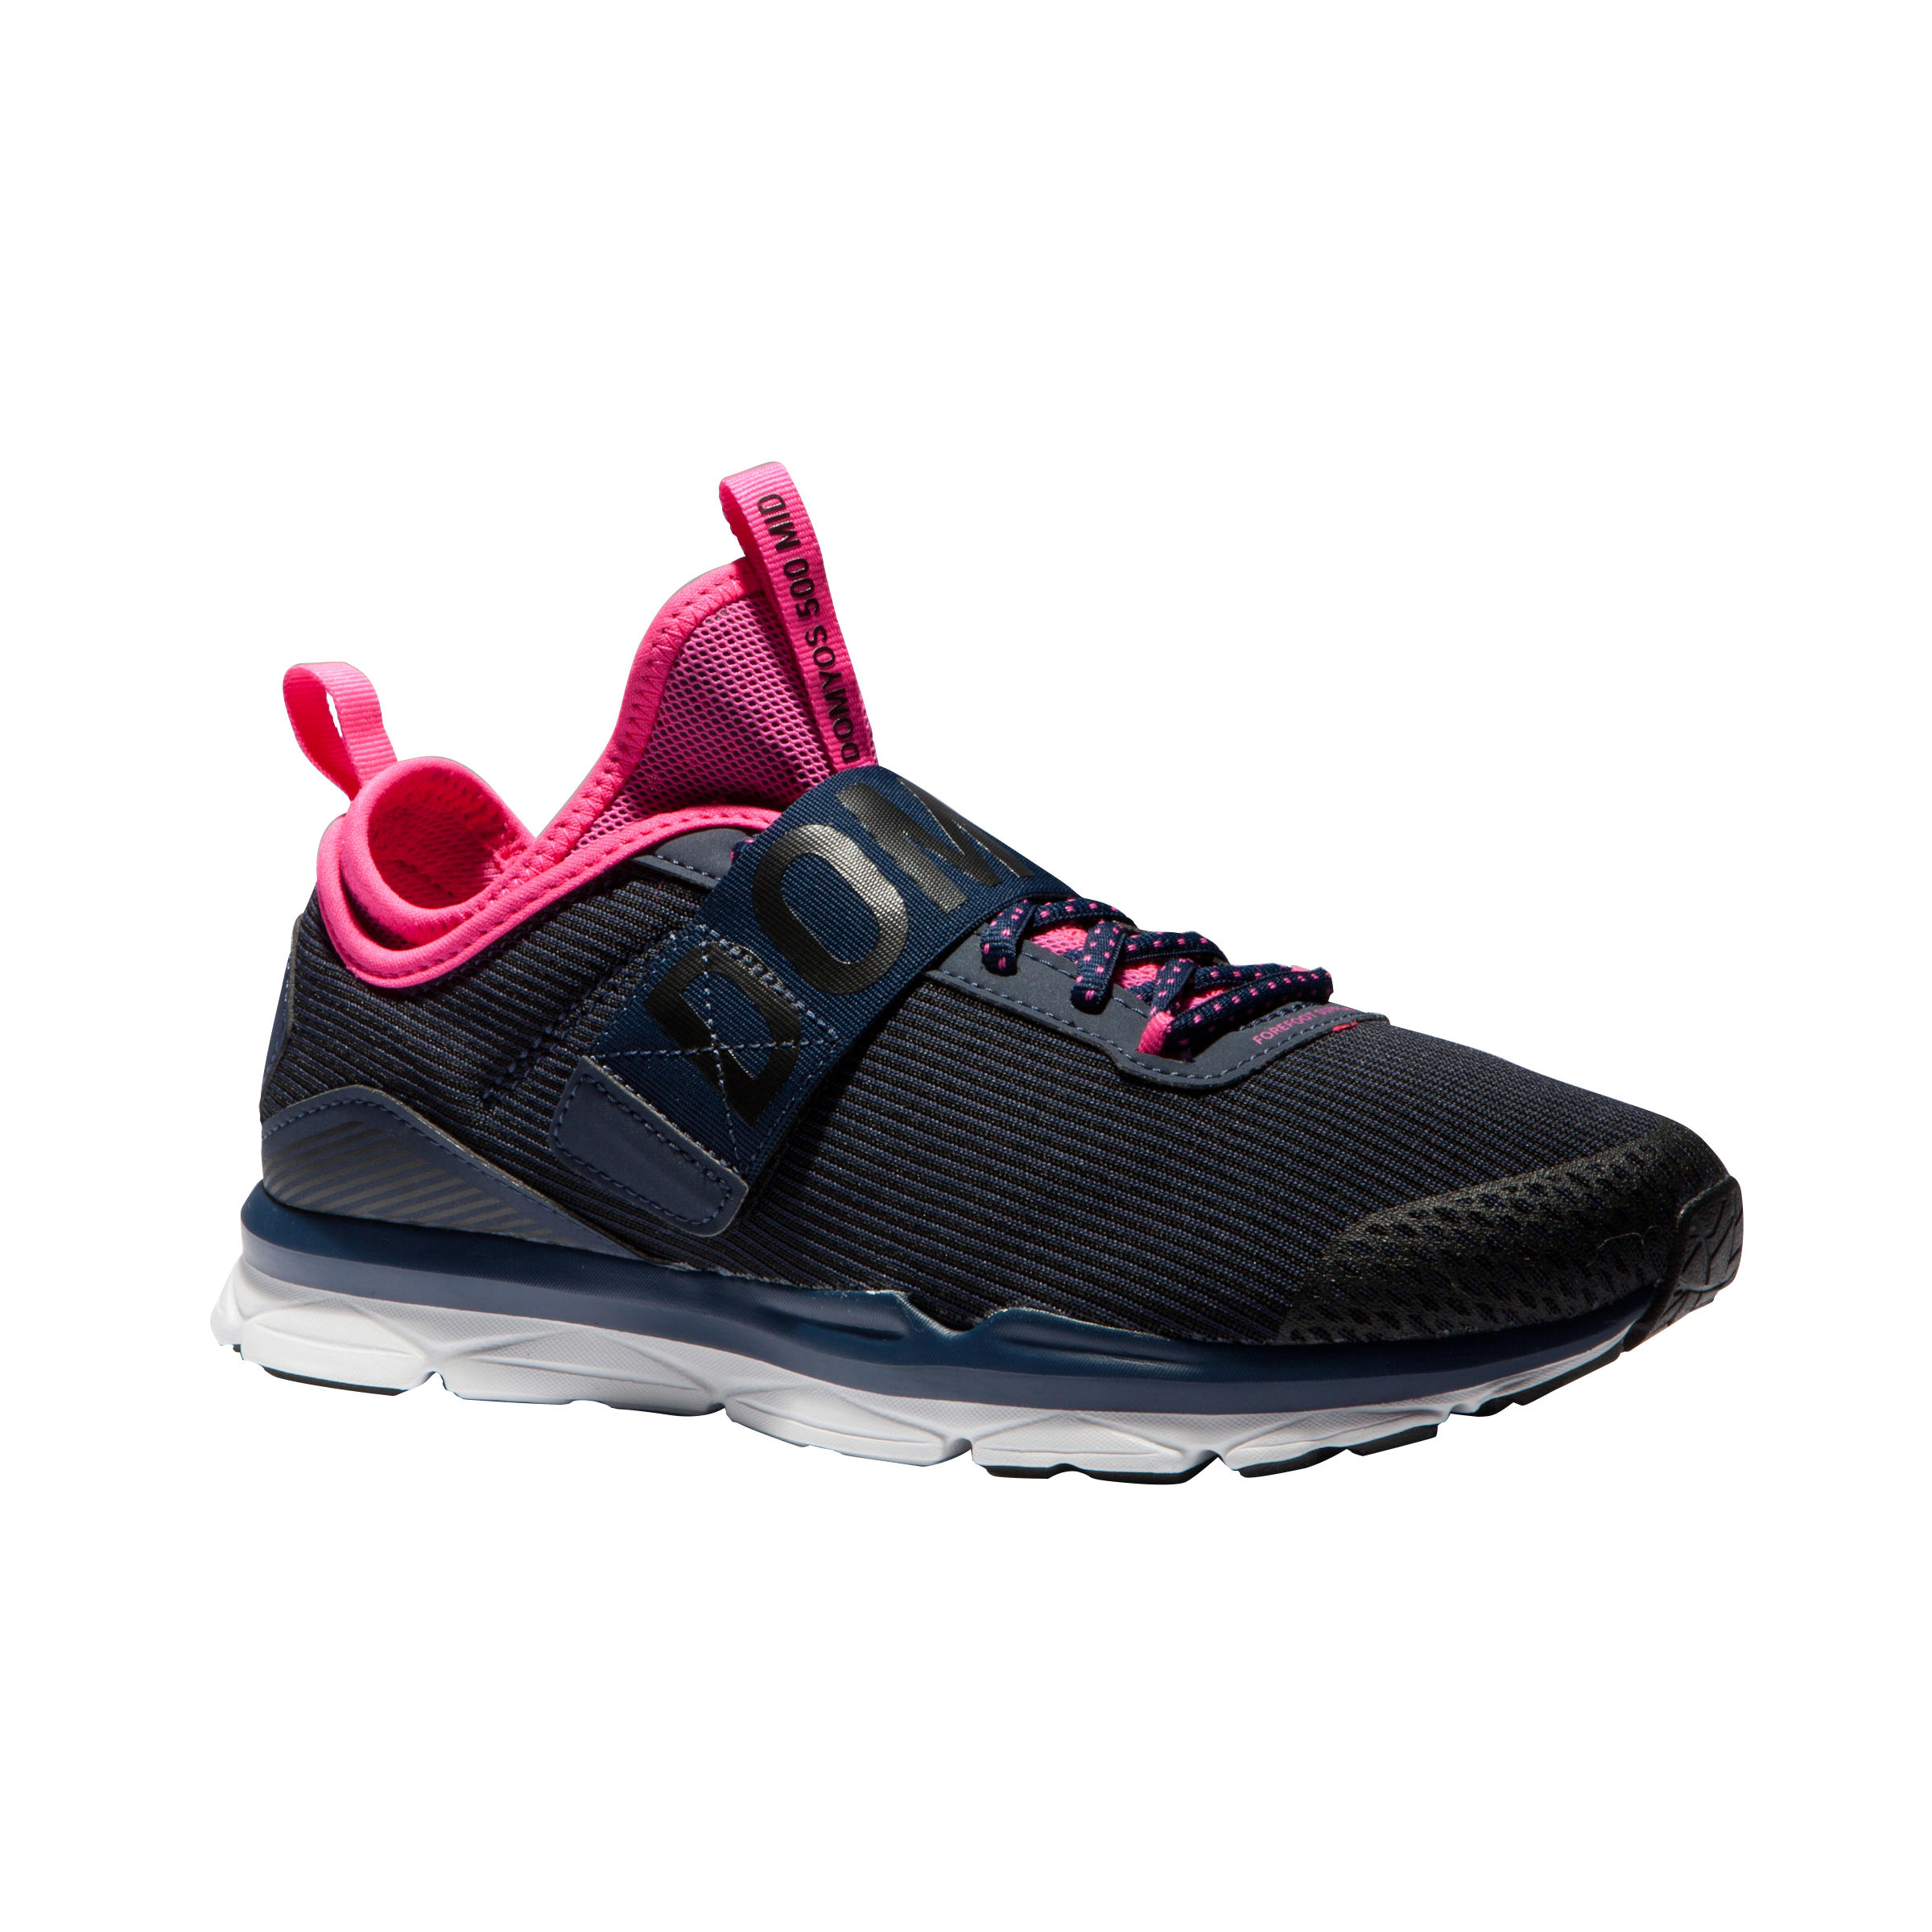 63f6b1aa1d4 Domyos Fitnessschoenen Cardio 500 Mid dames blauw en roze